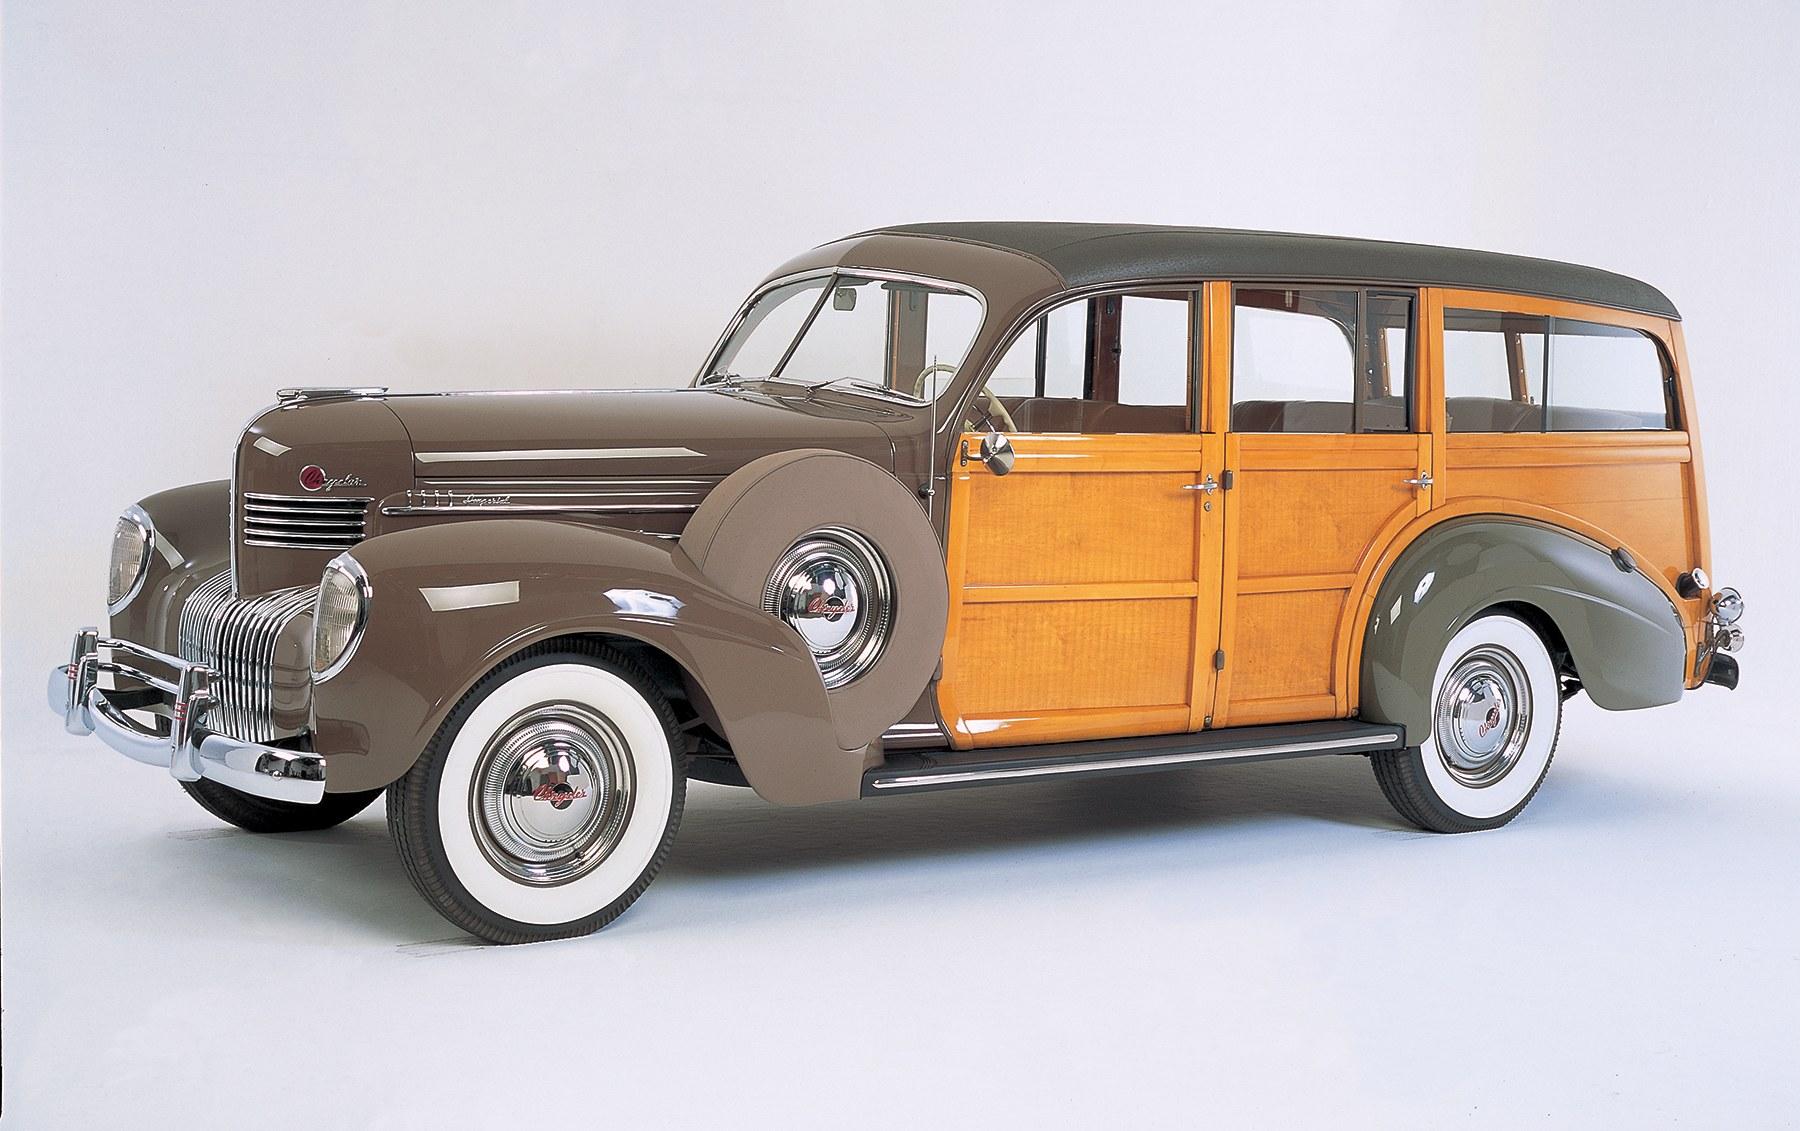 1939 Chrysler Imperial 8-Cylinder Station Wagon